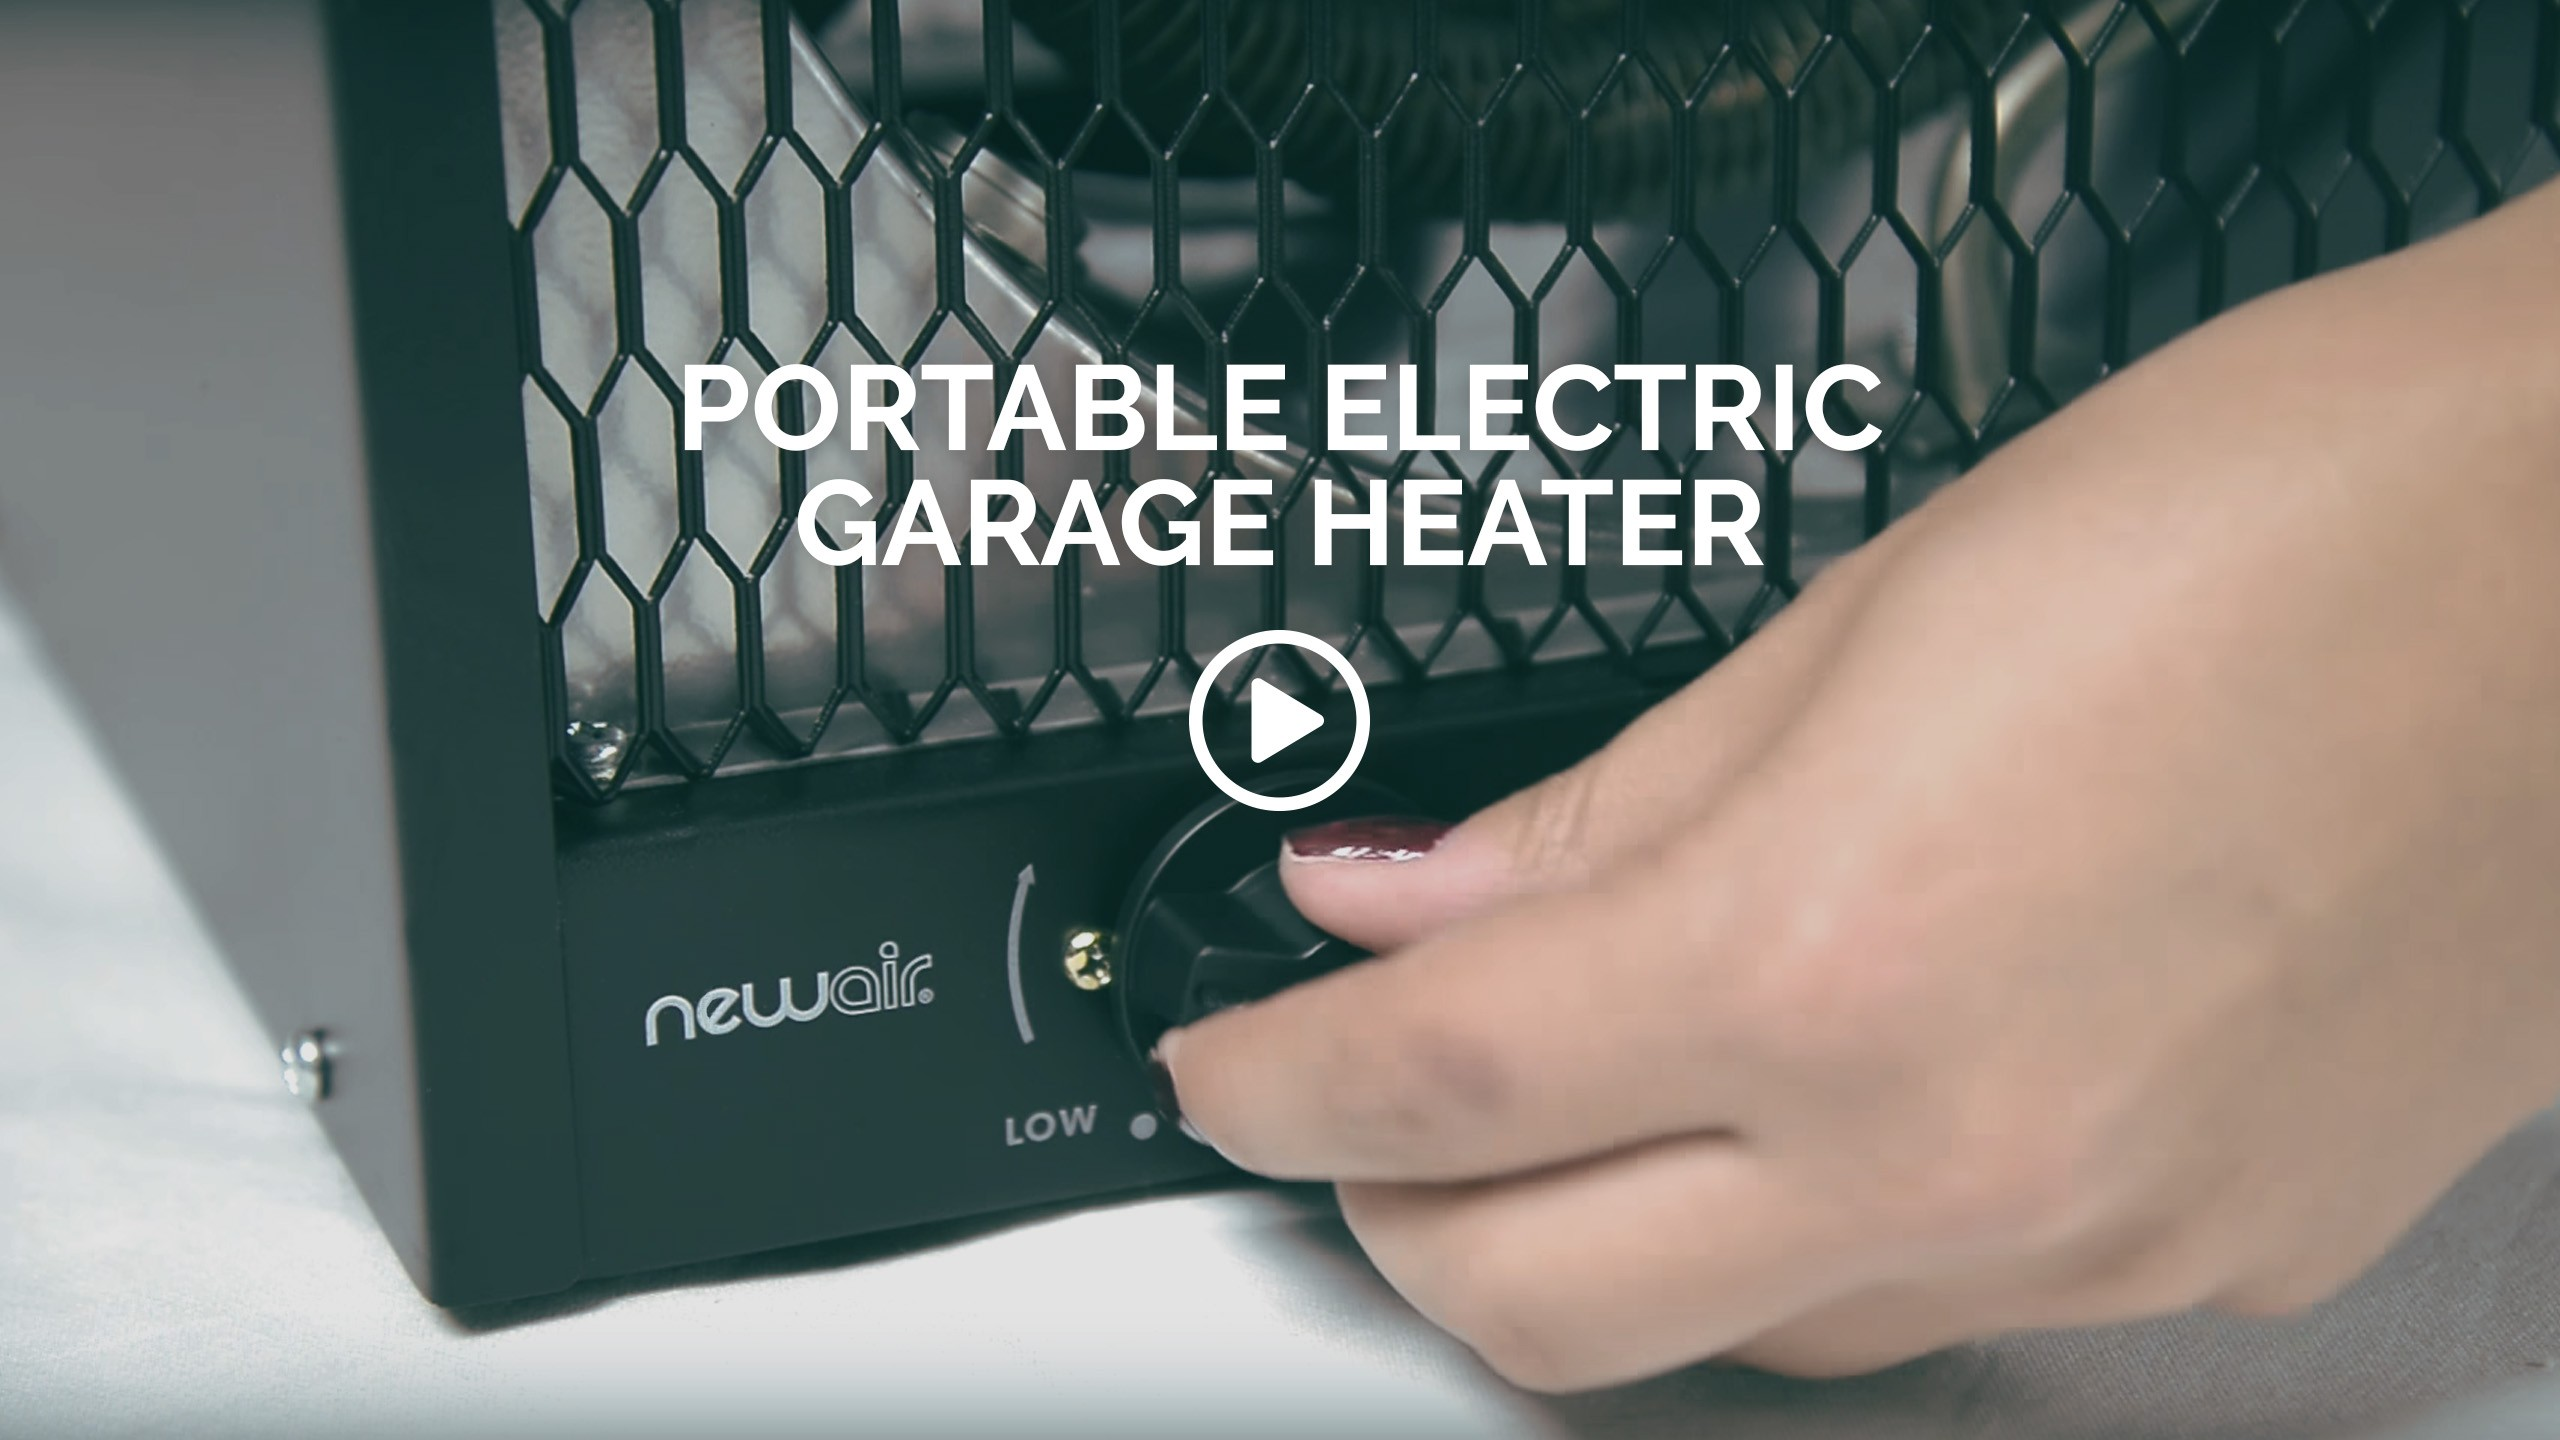 NewAir G56 Garage Heater | 800 Sq. Ft. Portable Electric ...